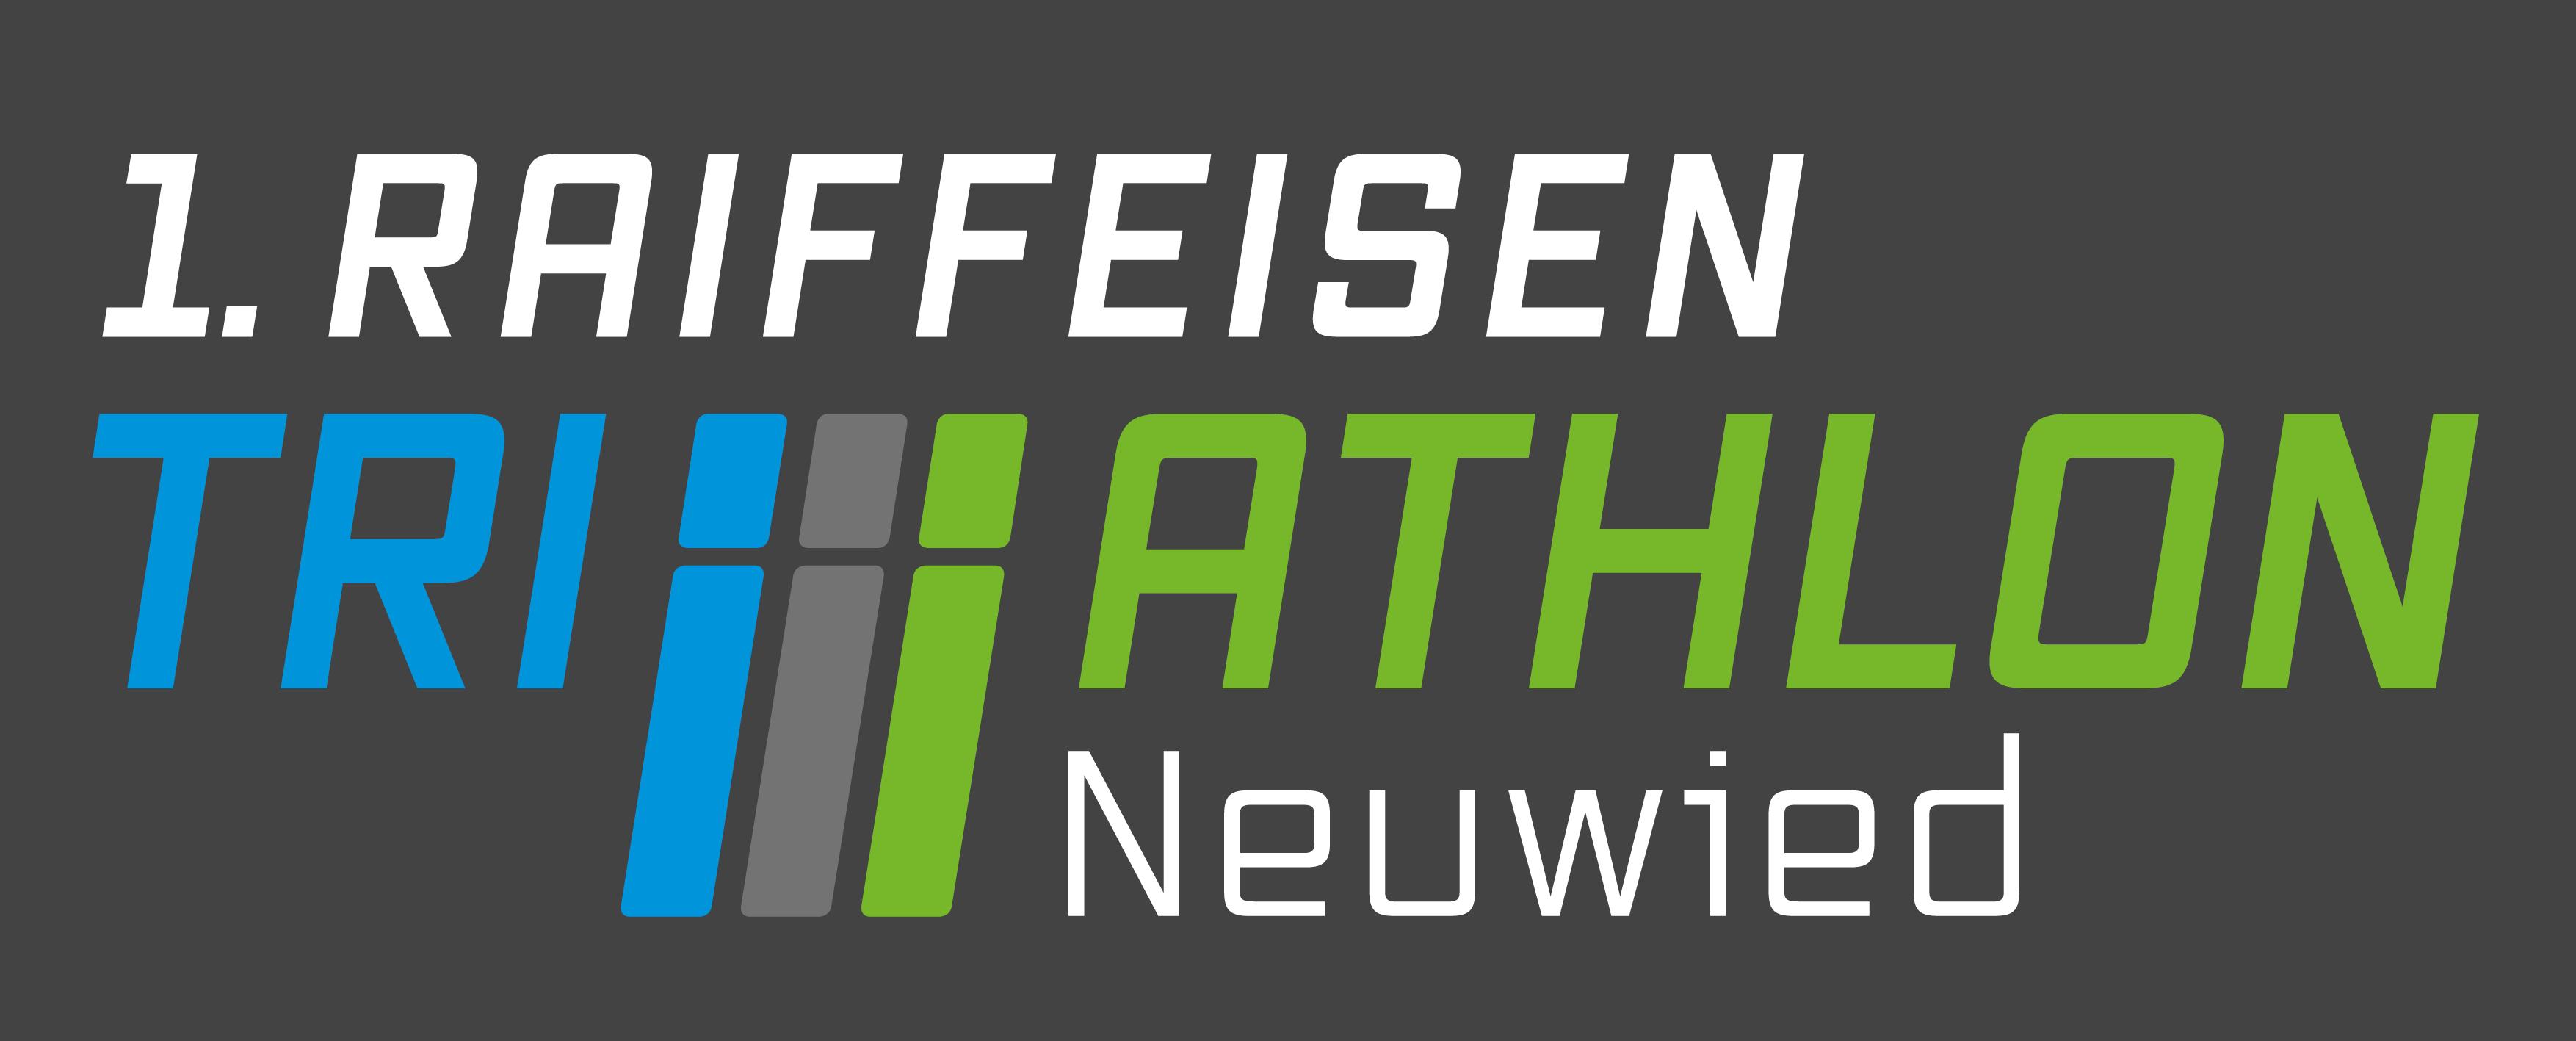 Raiffeisentriathlon Neuwied 2017